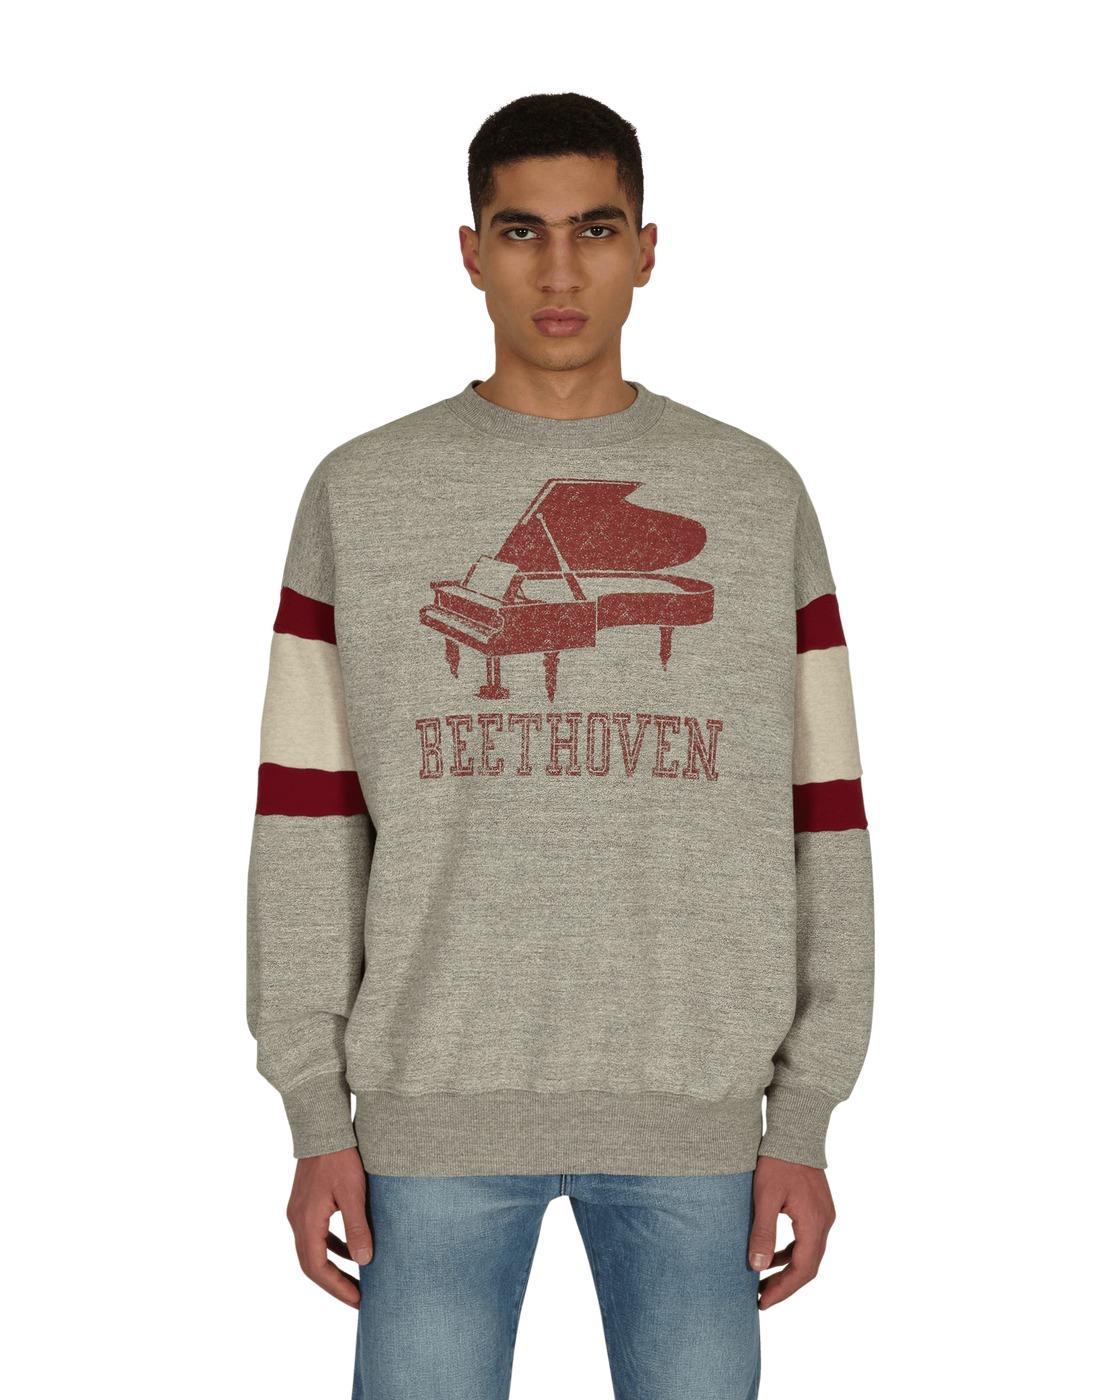 Kapital Top Fleece Knit Dolman Grand Piano Crewneck Sweatshirt Gray